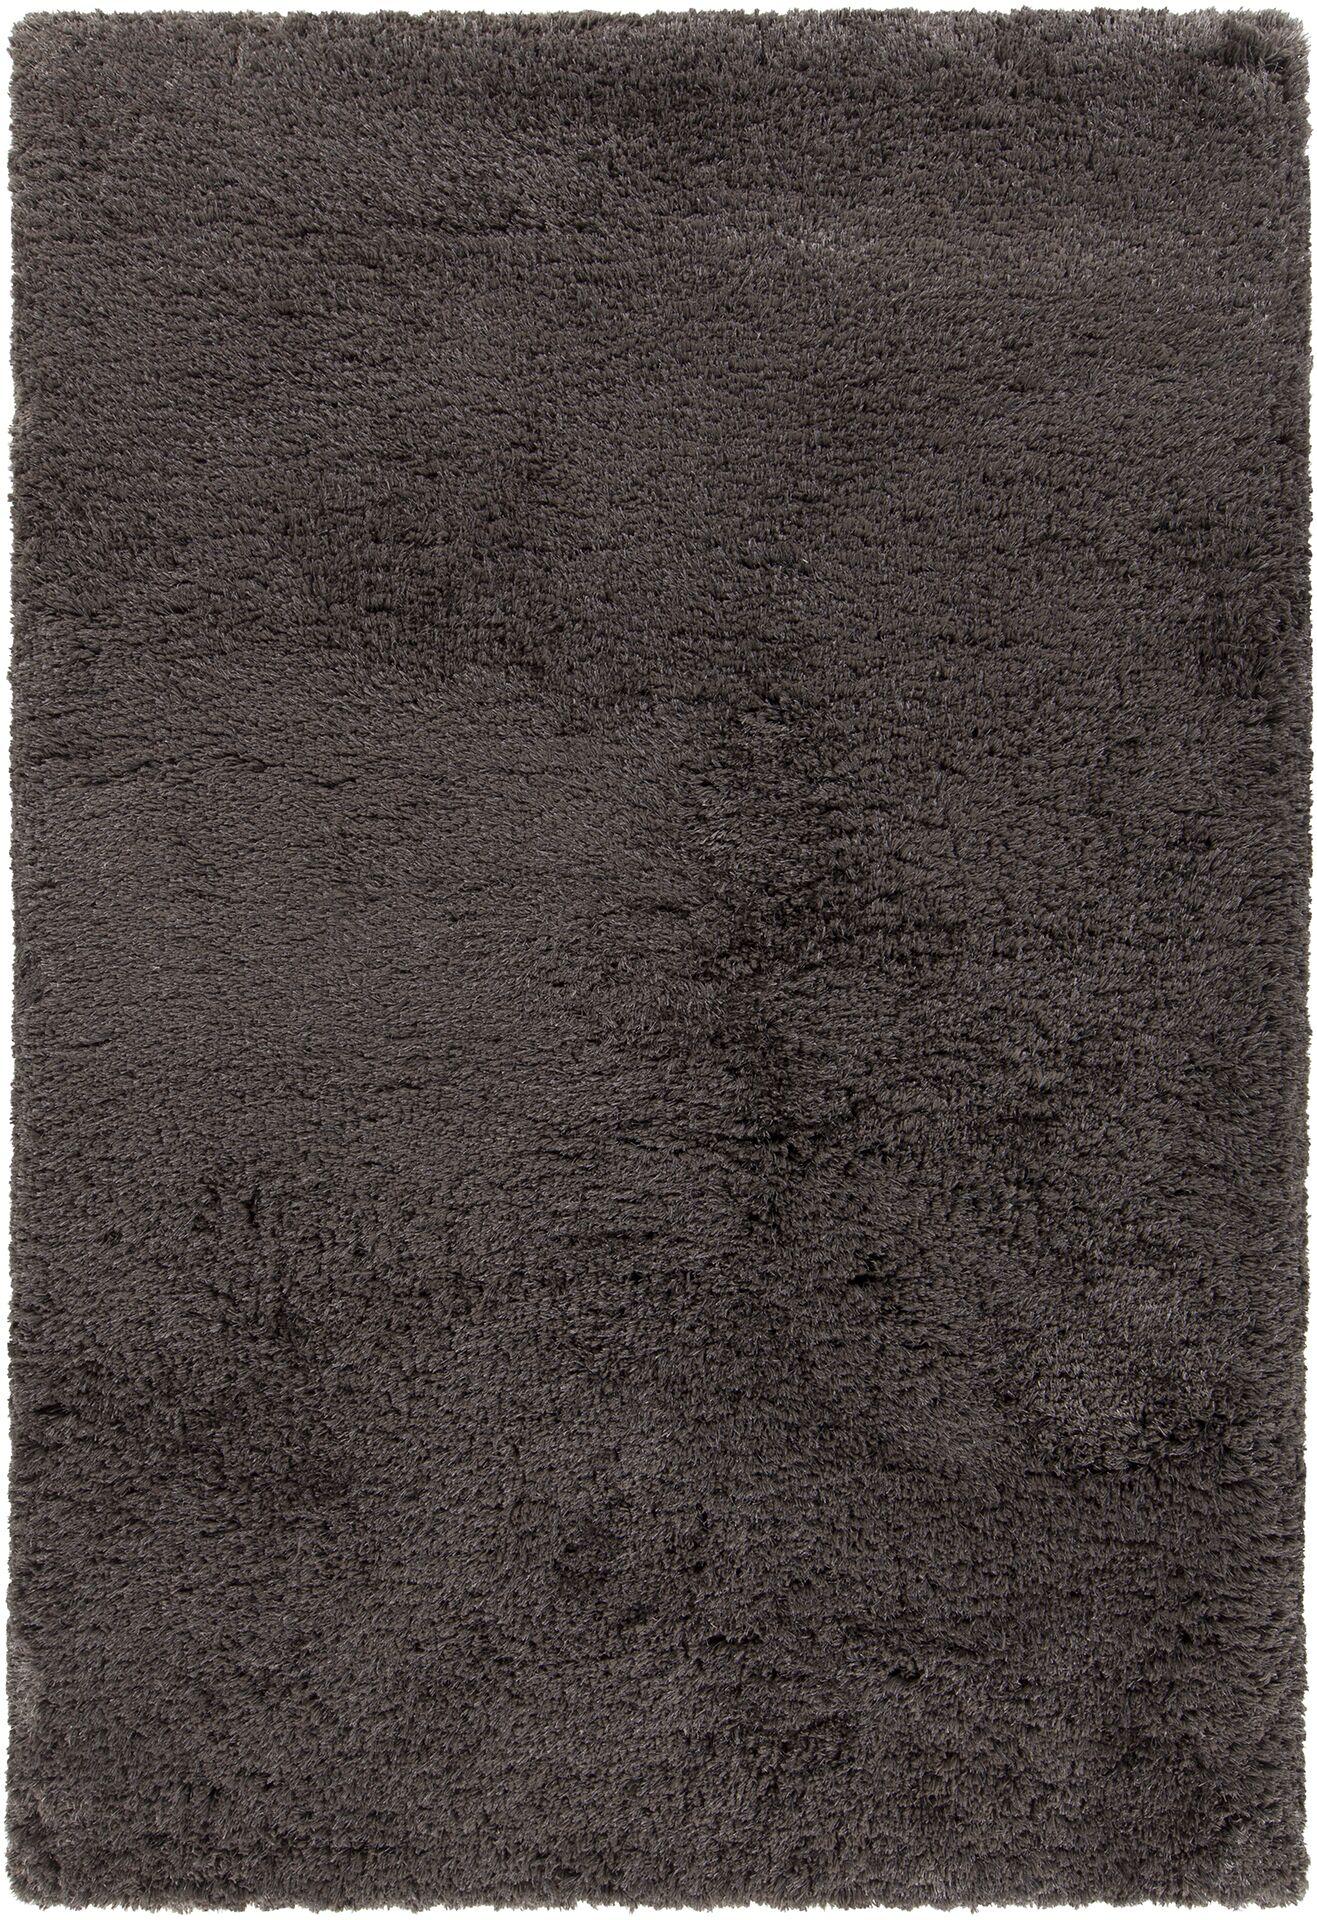 Garretson Hand-Woven Brown Area Rug Rug Size: 7'9